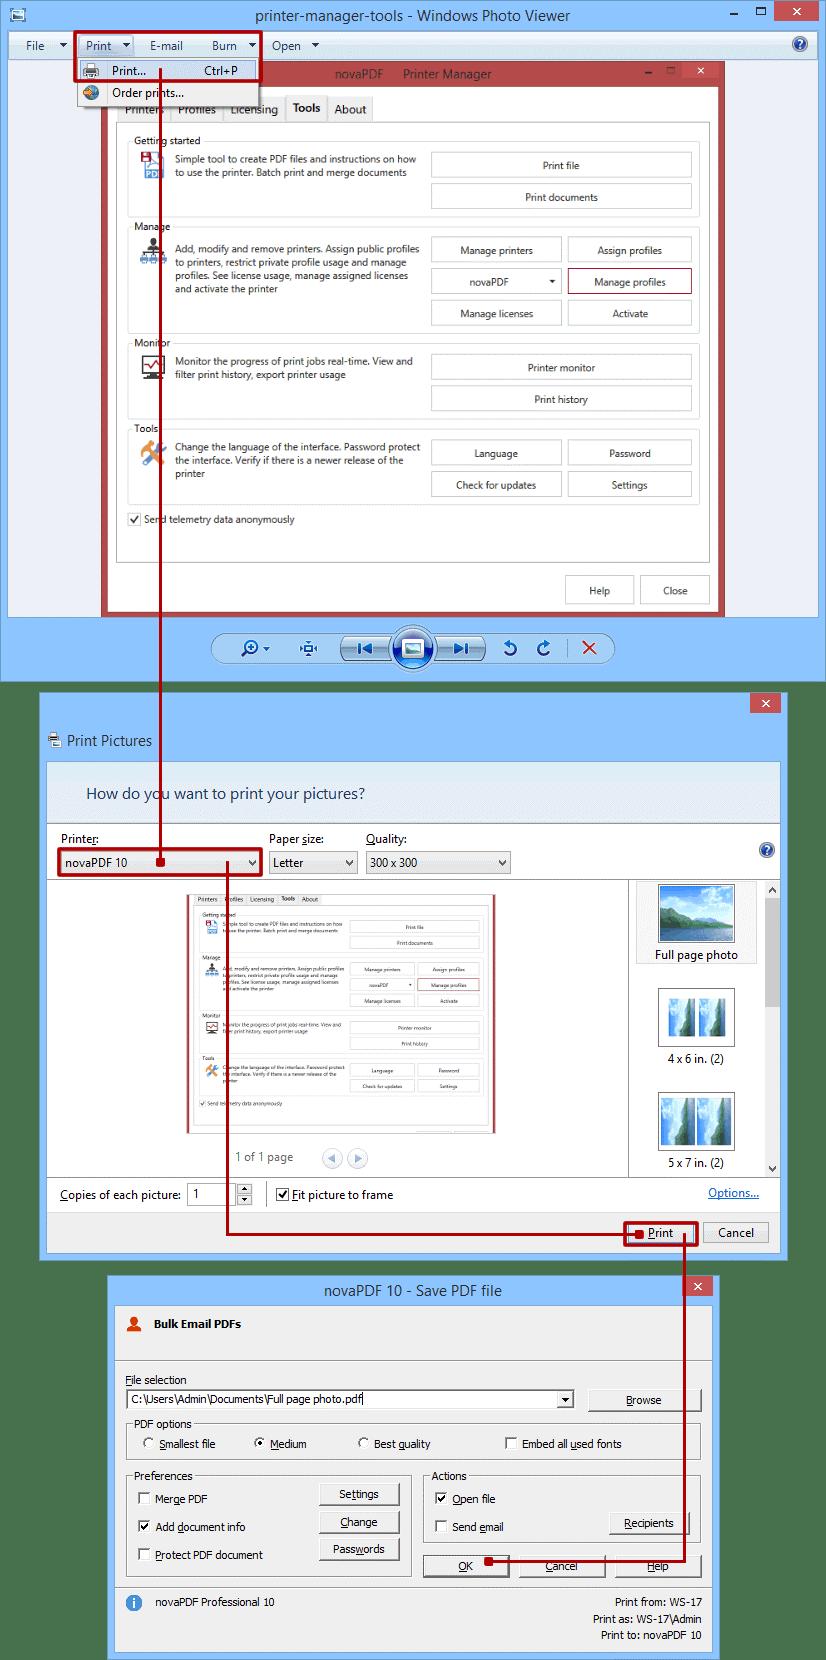 Windows Photo Viewer بهترین نرم افزار تبدیل عکس به پی دی اف - چیکاو